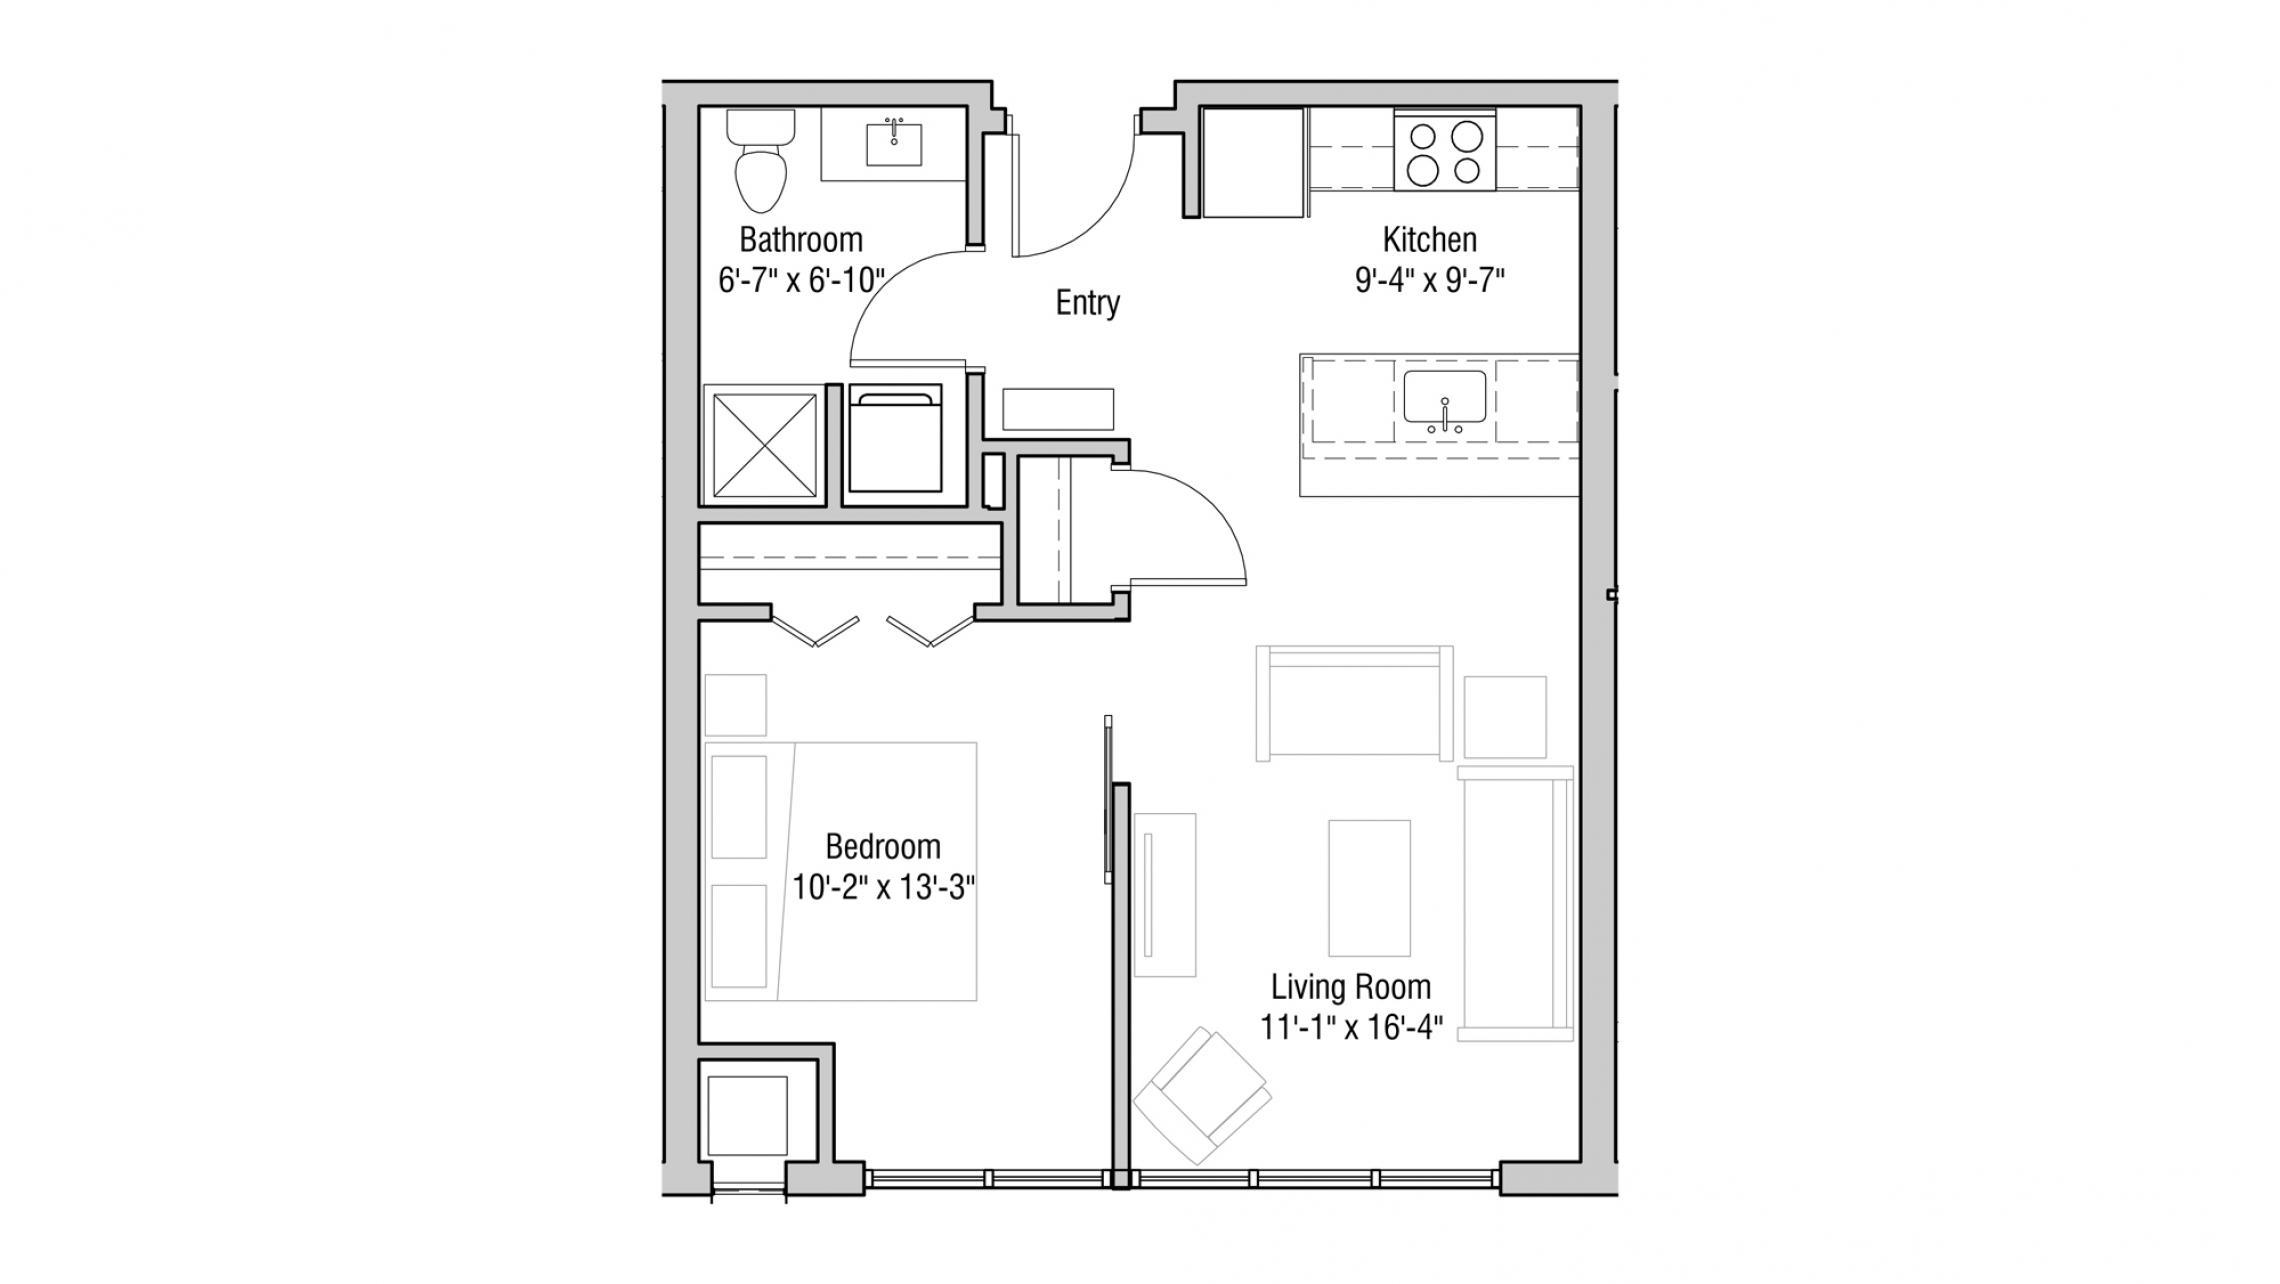 ULI Quarter Row 407 - One Bedroom, One Bathroom